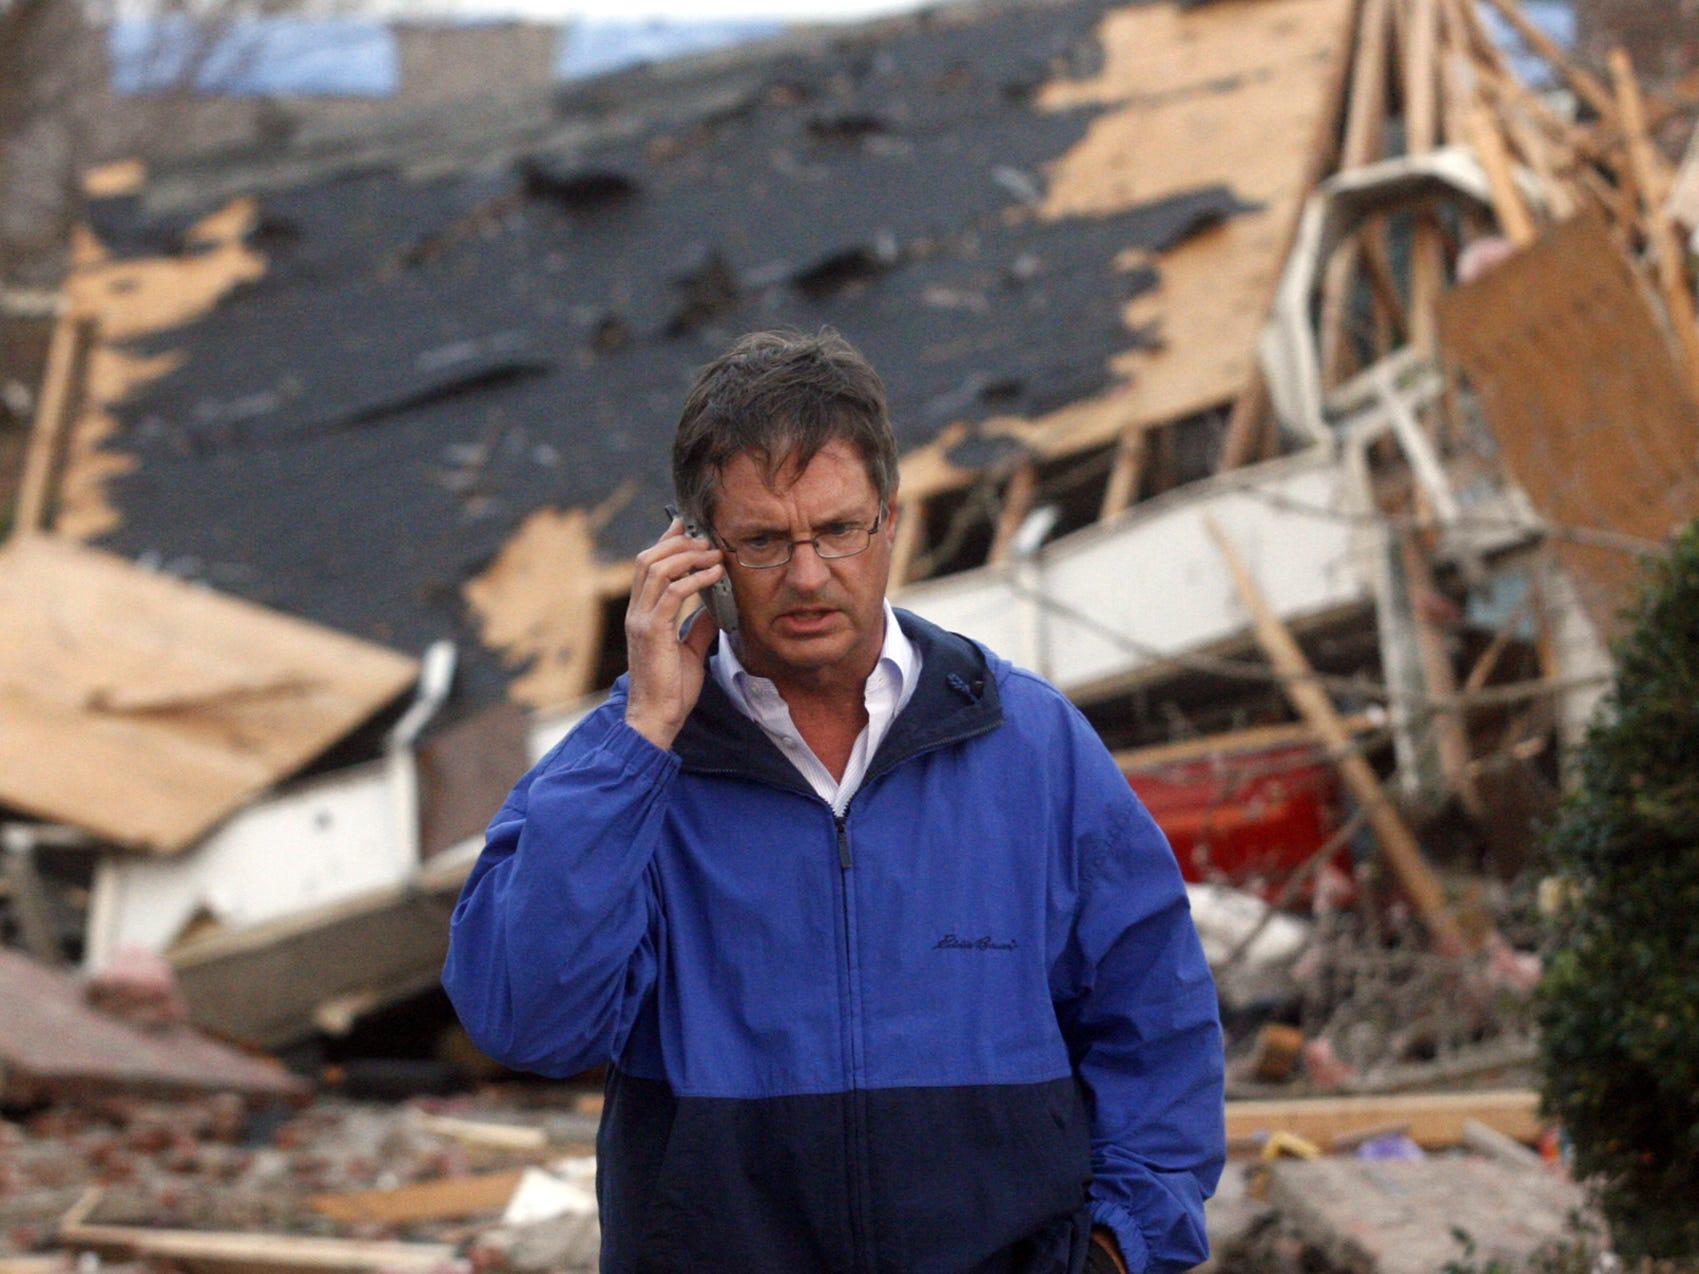 DNJ photo by John A. Gillis    Murfreesboro Mayor Tommy Bragg talks on the phone while inspecting tornado damage on Buckle Street in Murfreesboro Friday, April 10, 2009.